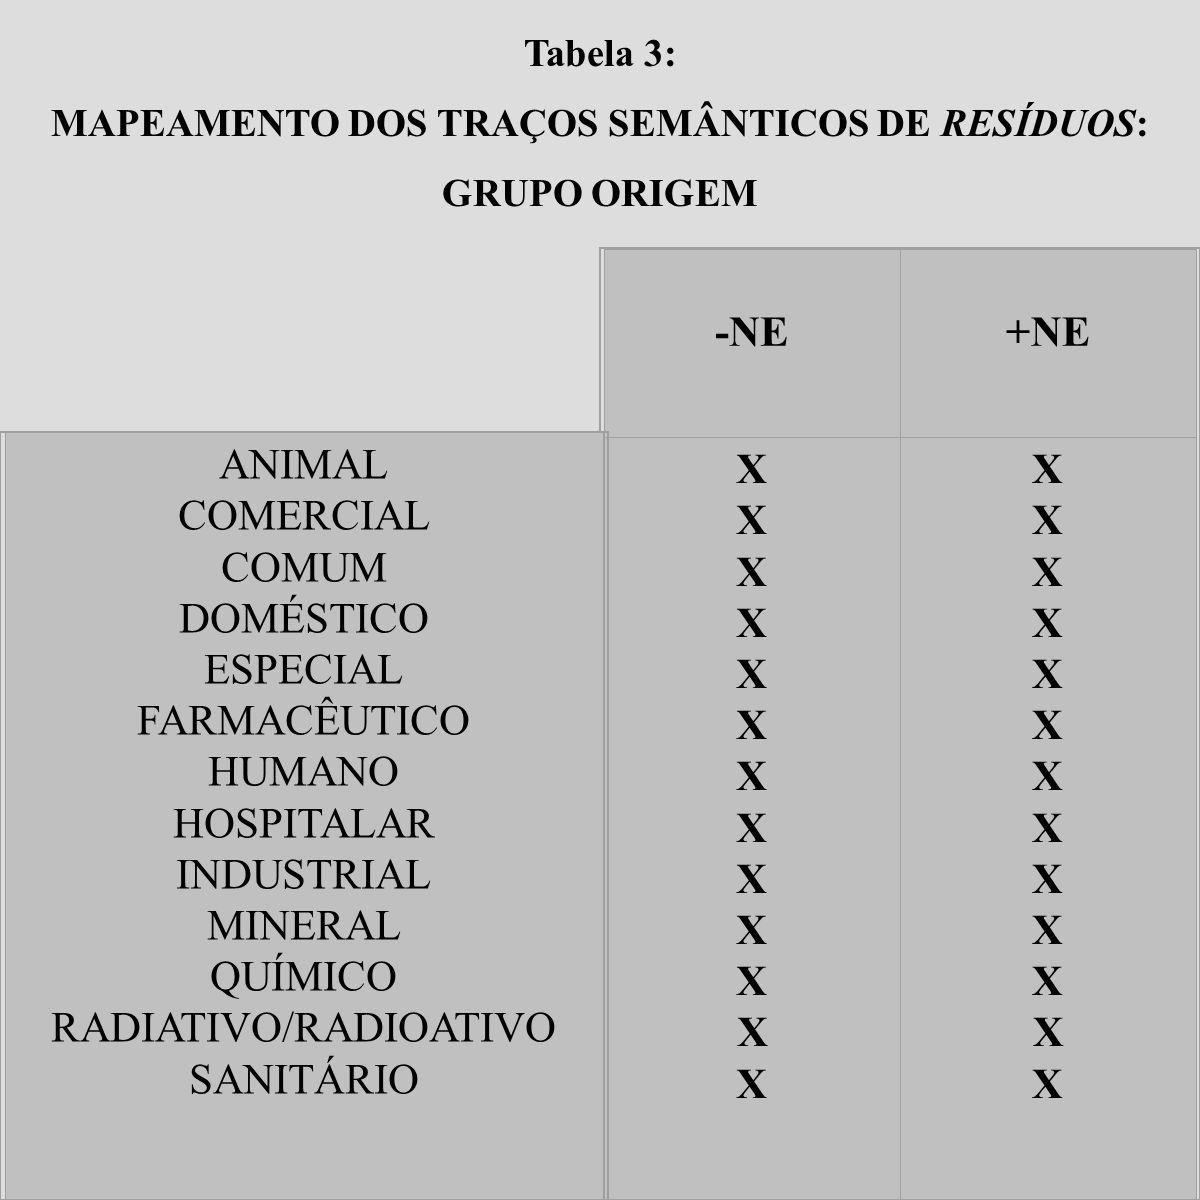 MAPEAMENTO DOS TRAÇOS SEMÂNTICOS DE RESÍDUOS: